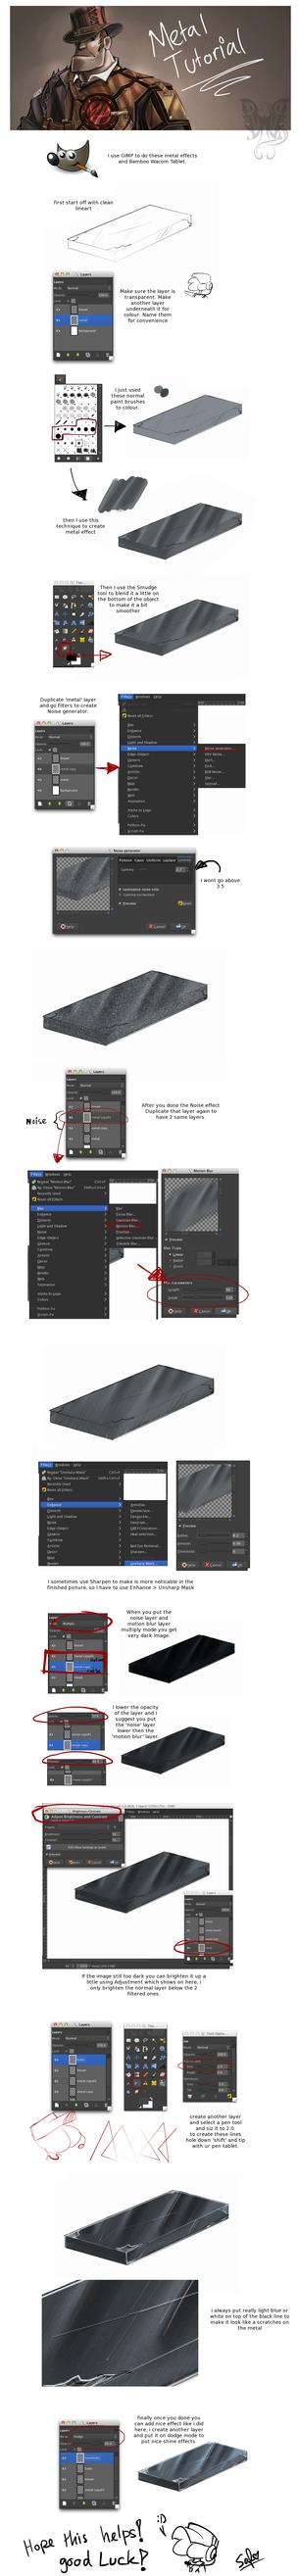 Tutorial: Metal effects in GIMP by DarkLitria